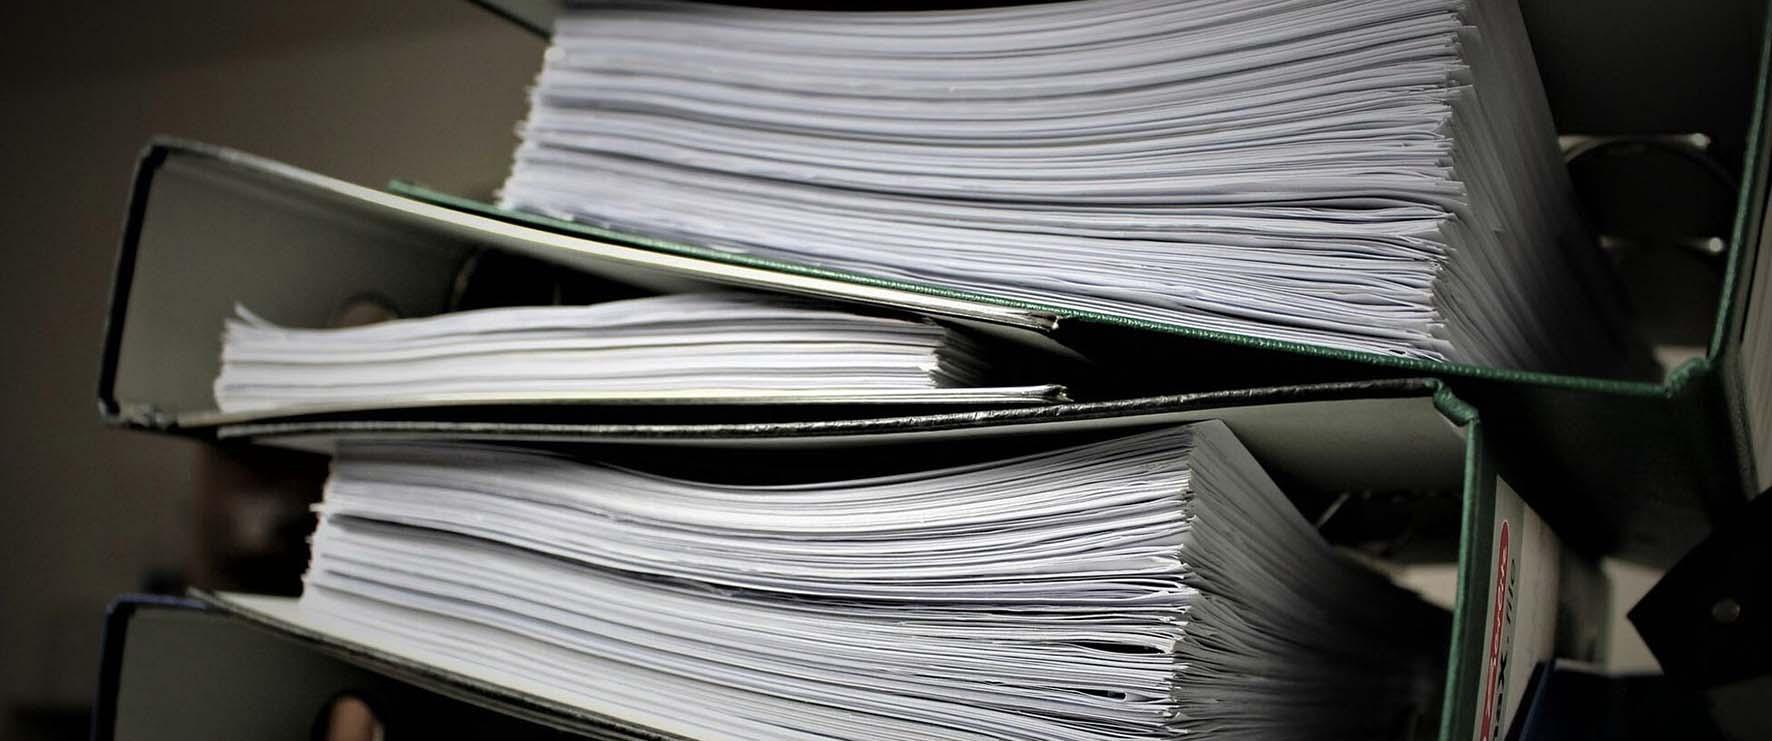 burocrazia carte faldoni